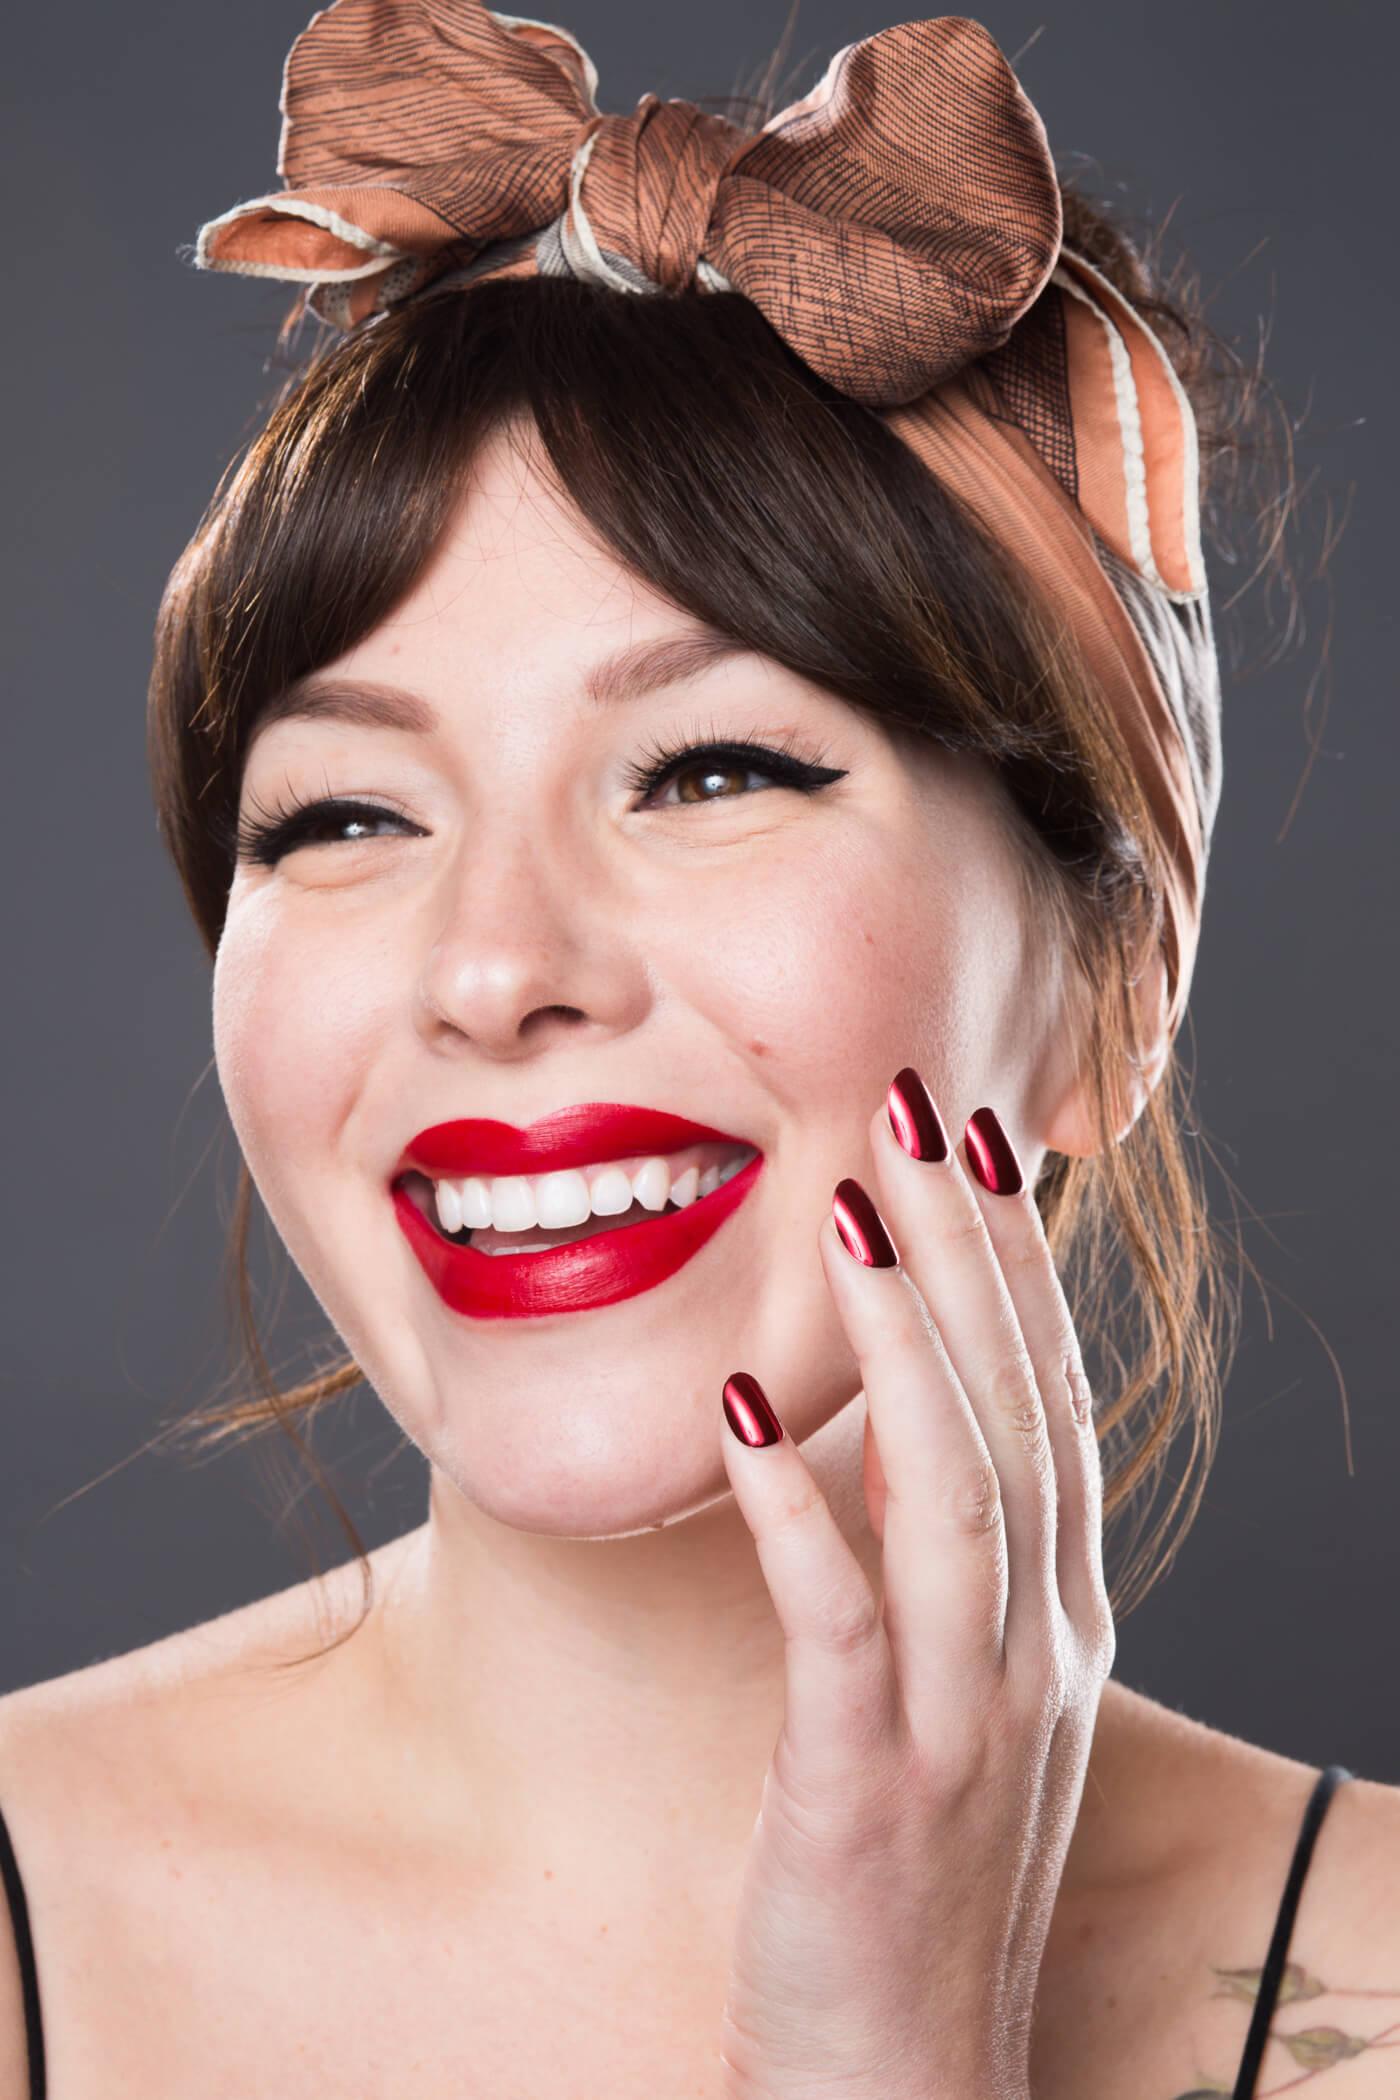 100% pure lipstick swatches Cocoa Butter Matte Lipstick in Nopal